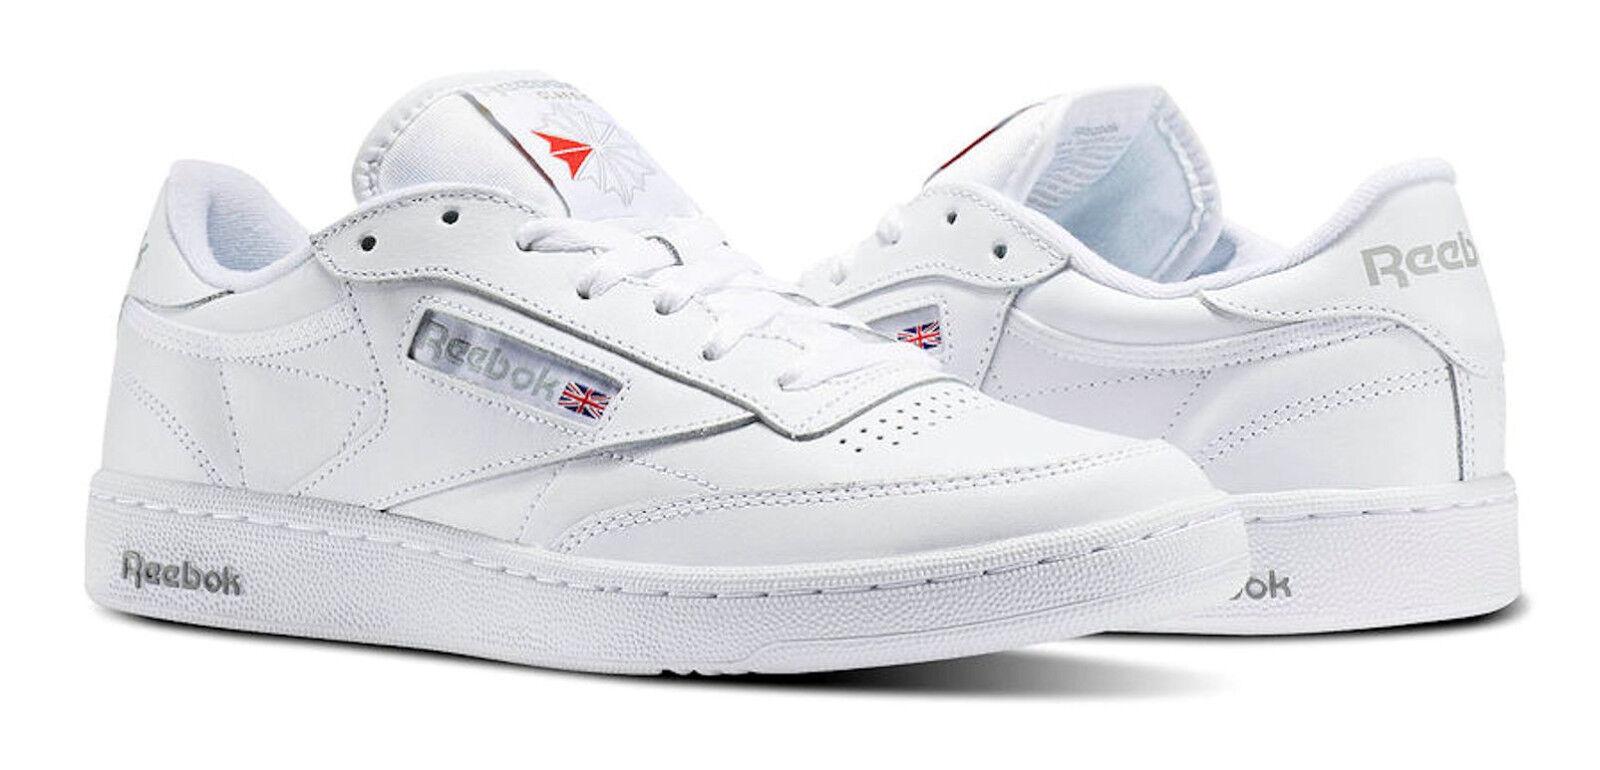 Reebok Classic Club C 85 Tg Steel Carbon Gum Mens 13 Shoes Sneakers Bd1886 For Sale Online Ebay